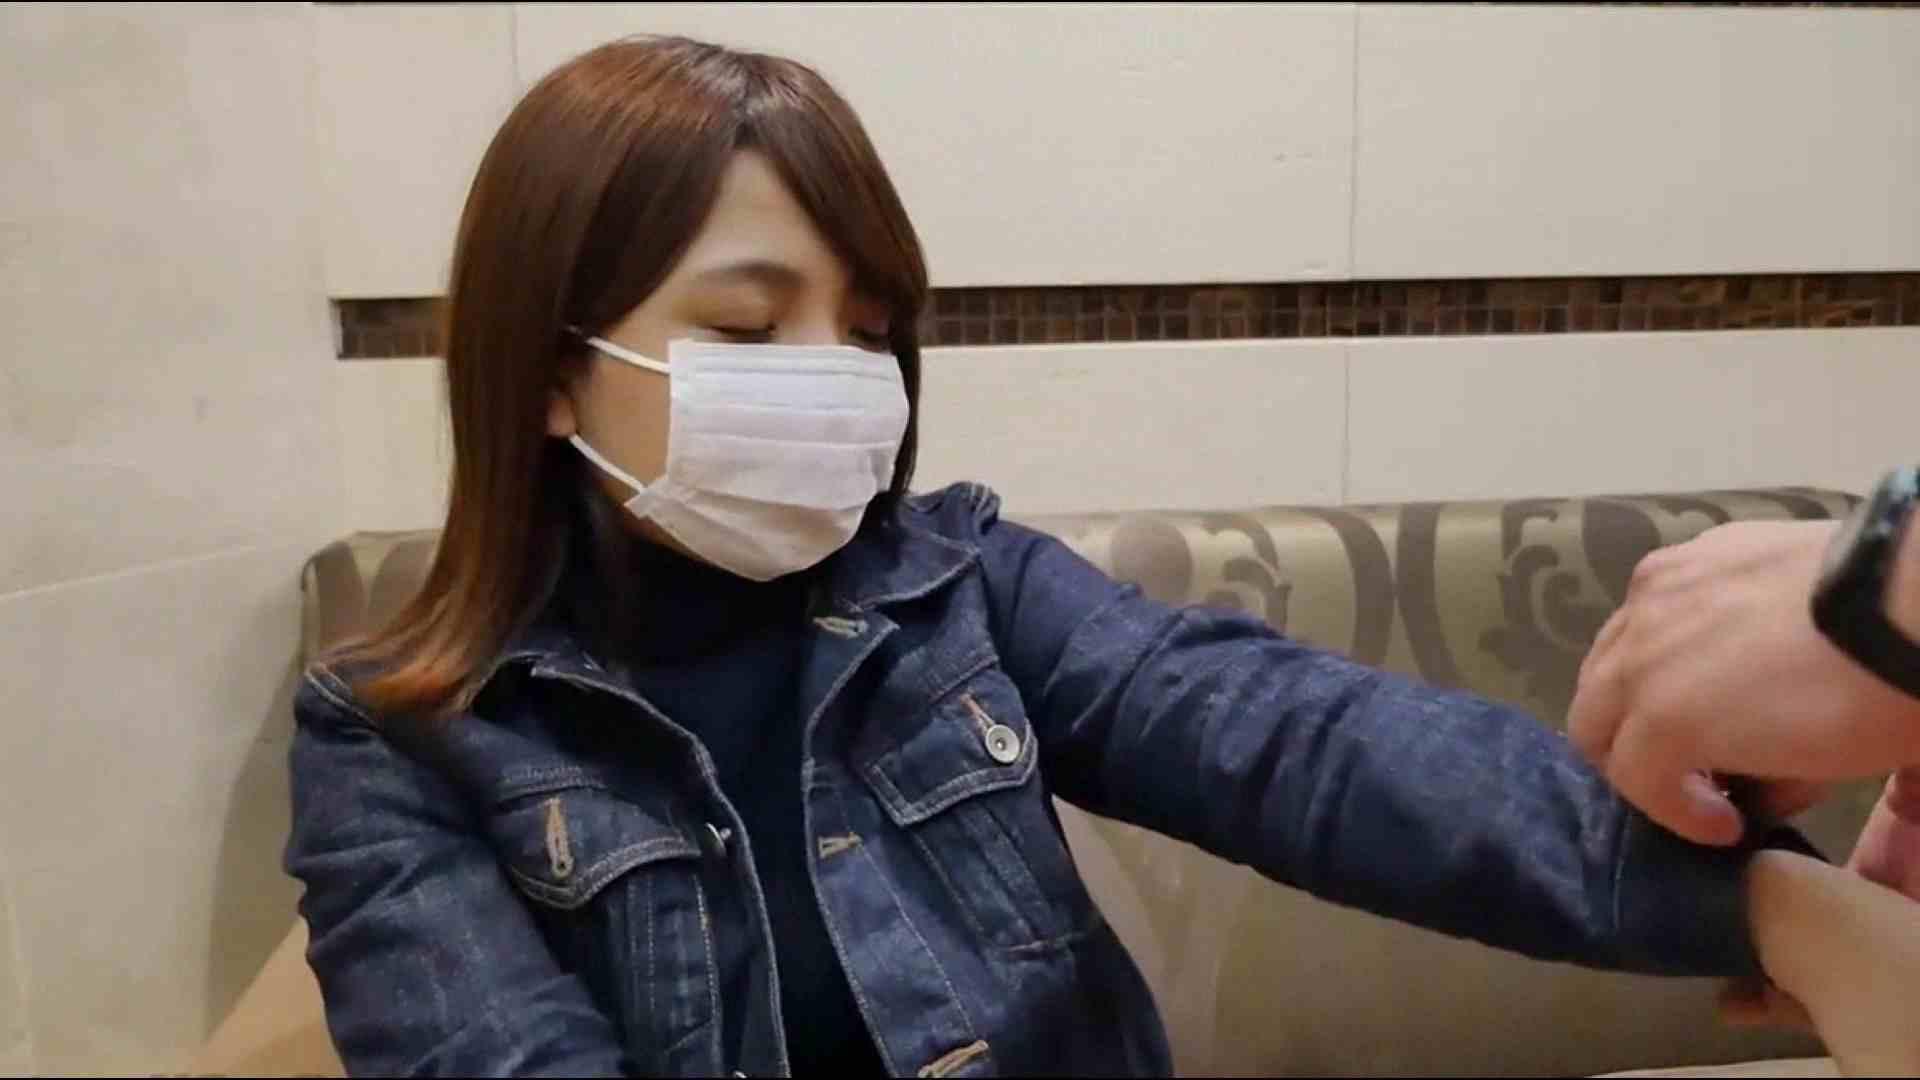 S級厳選美女ビッチガールVol.41 前編 OL女体   美女  105連発 31